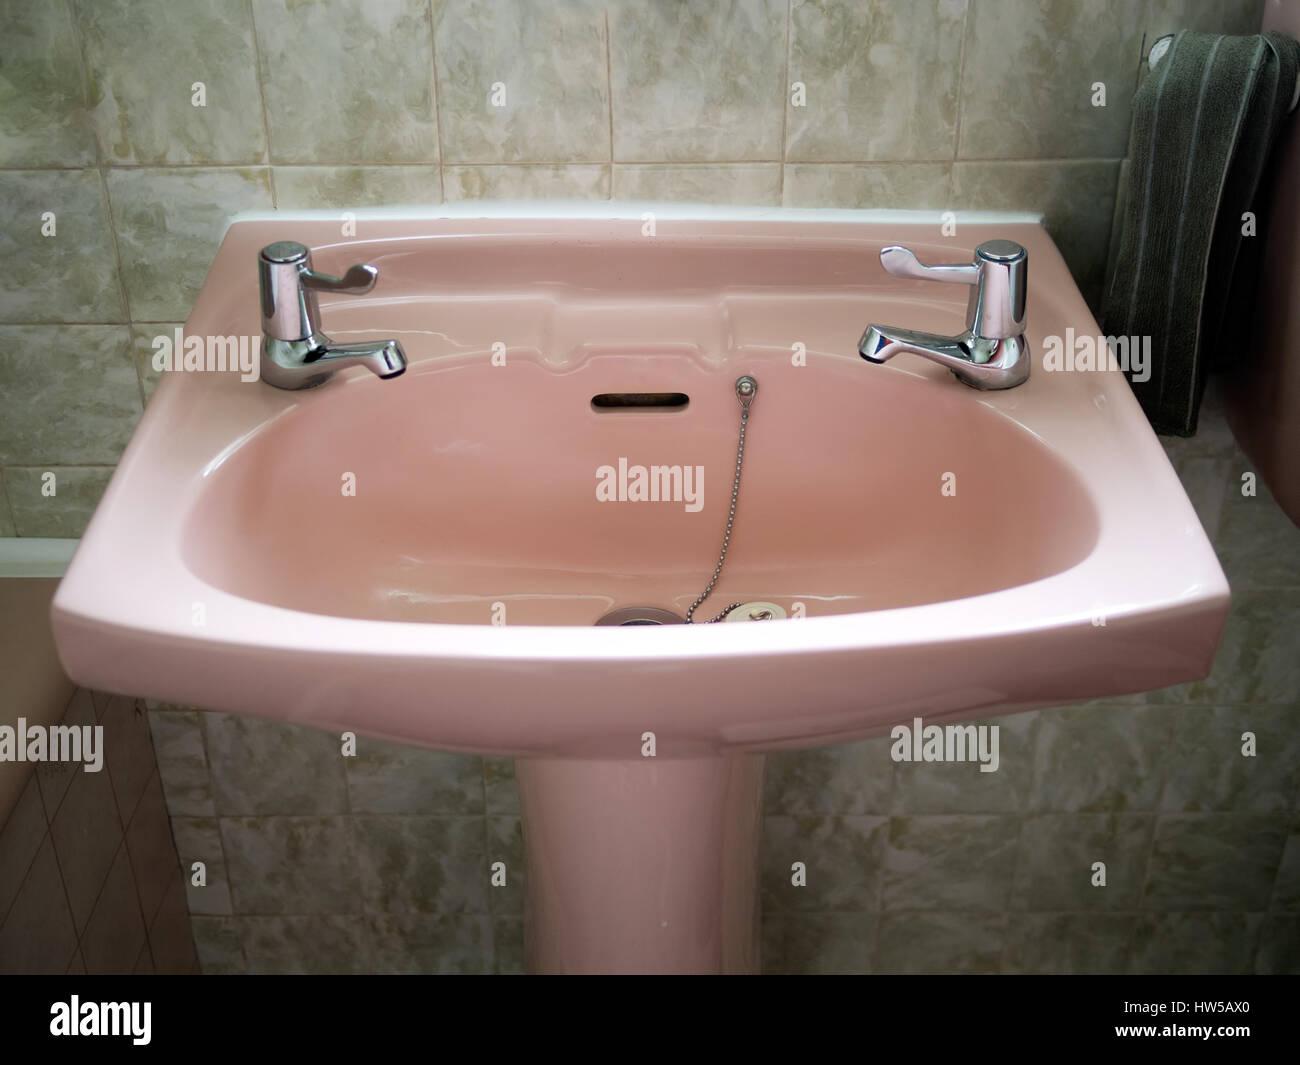 Pedestal Sink In Bathroom Stock Photos & Pedestal Sink In Bathroom ...